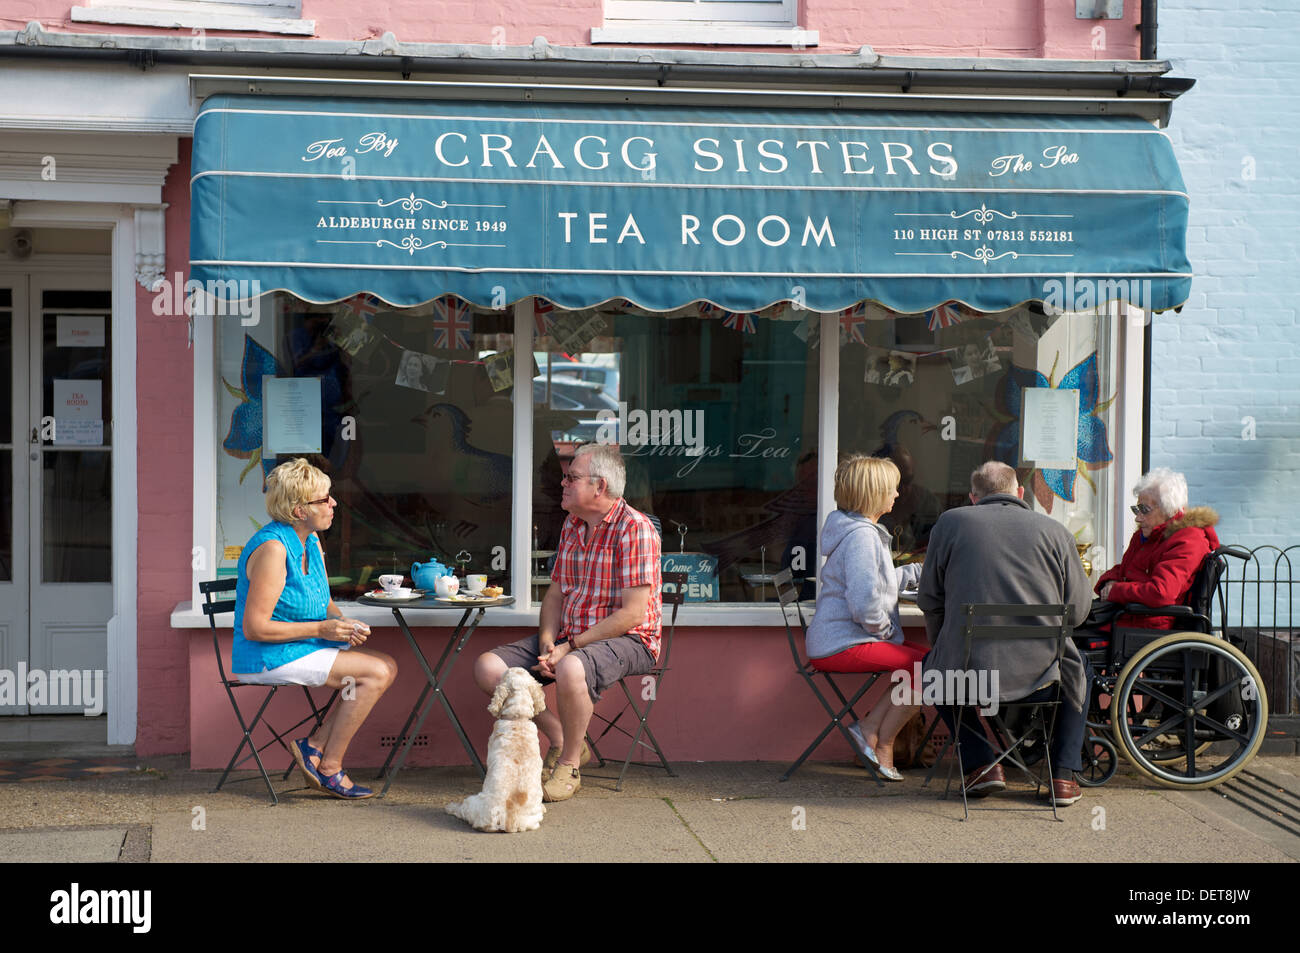 Seven Sisters Tea Room